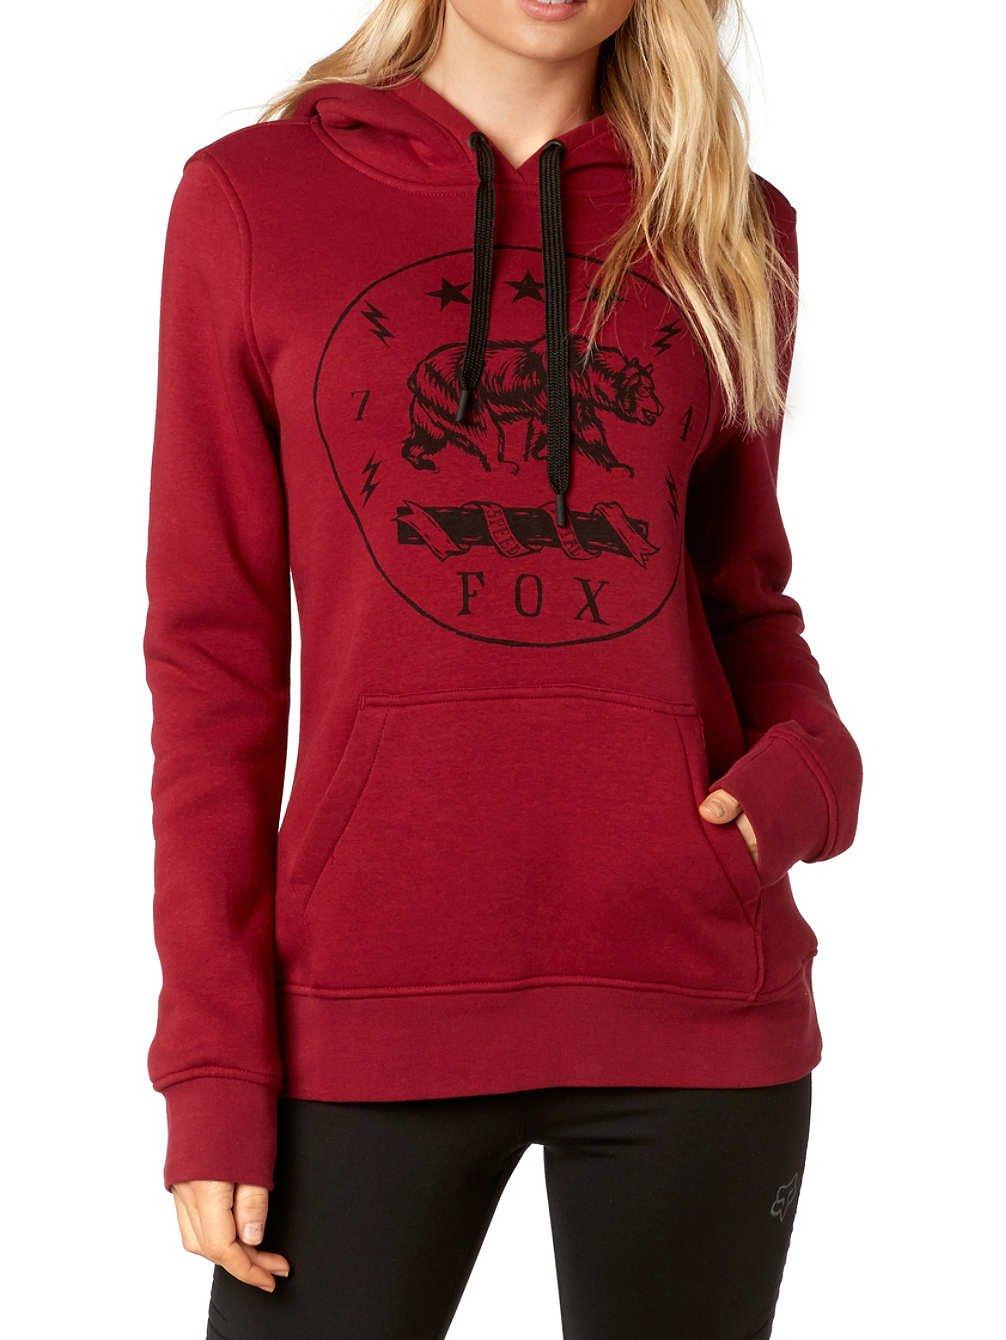 Fox Racing Womens Translunar Hoody Pullover Sweatshirts X-Small Dark Red